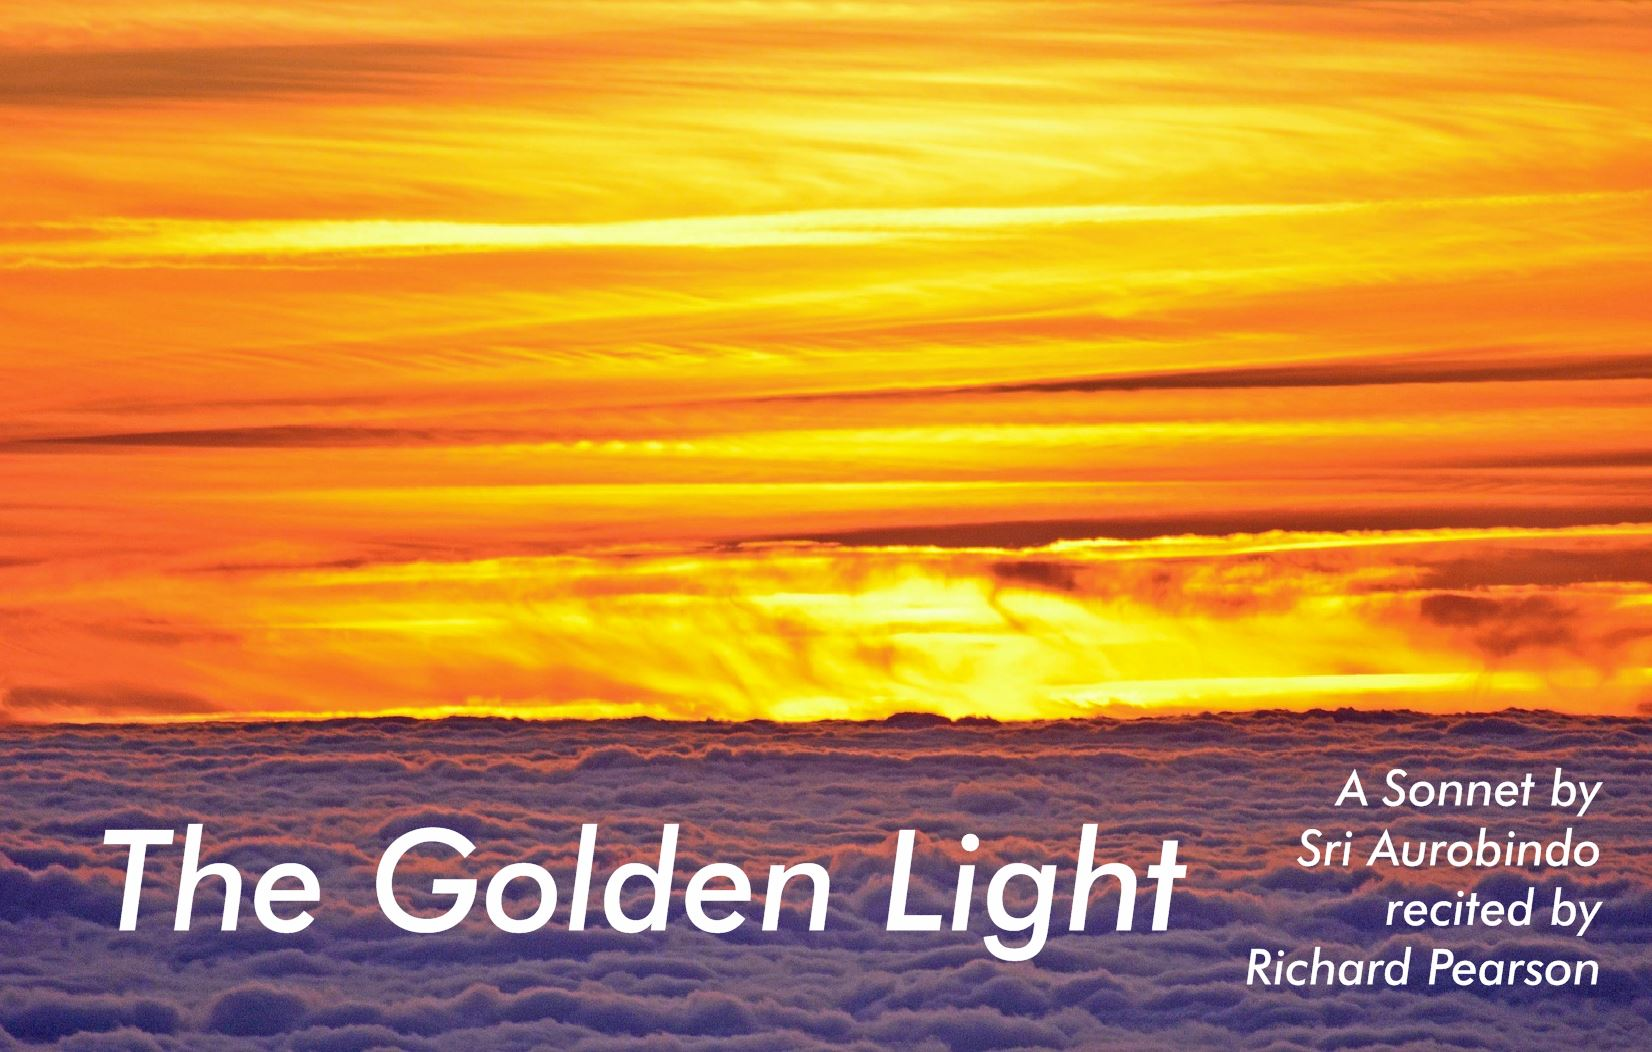 The Golden Light, Sri Aurobindo's poem recited by Richard Pearson